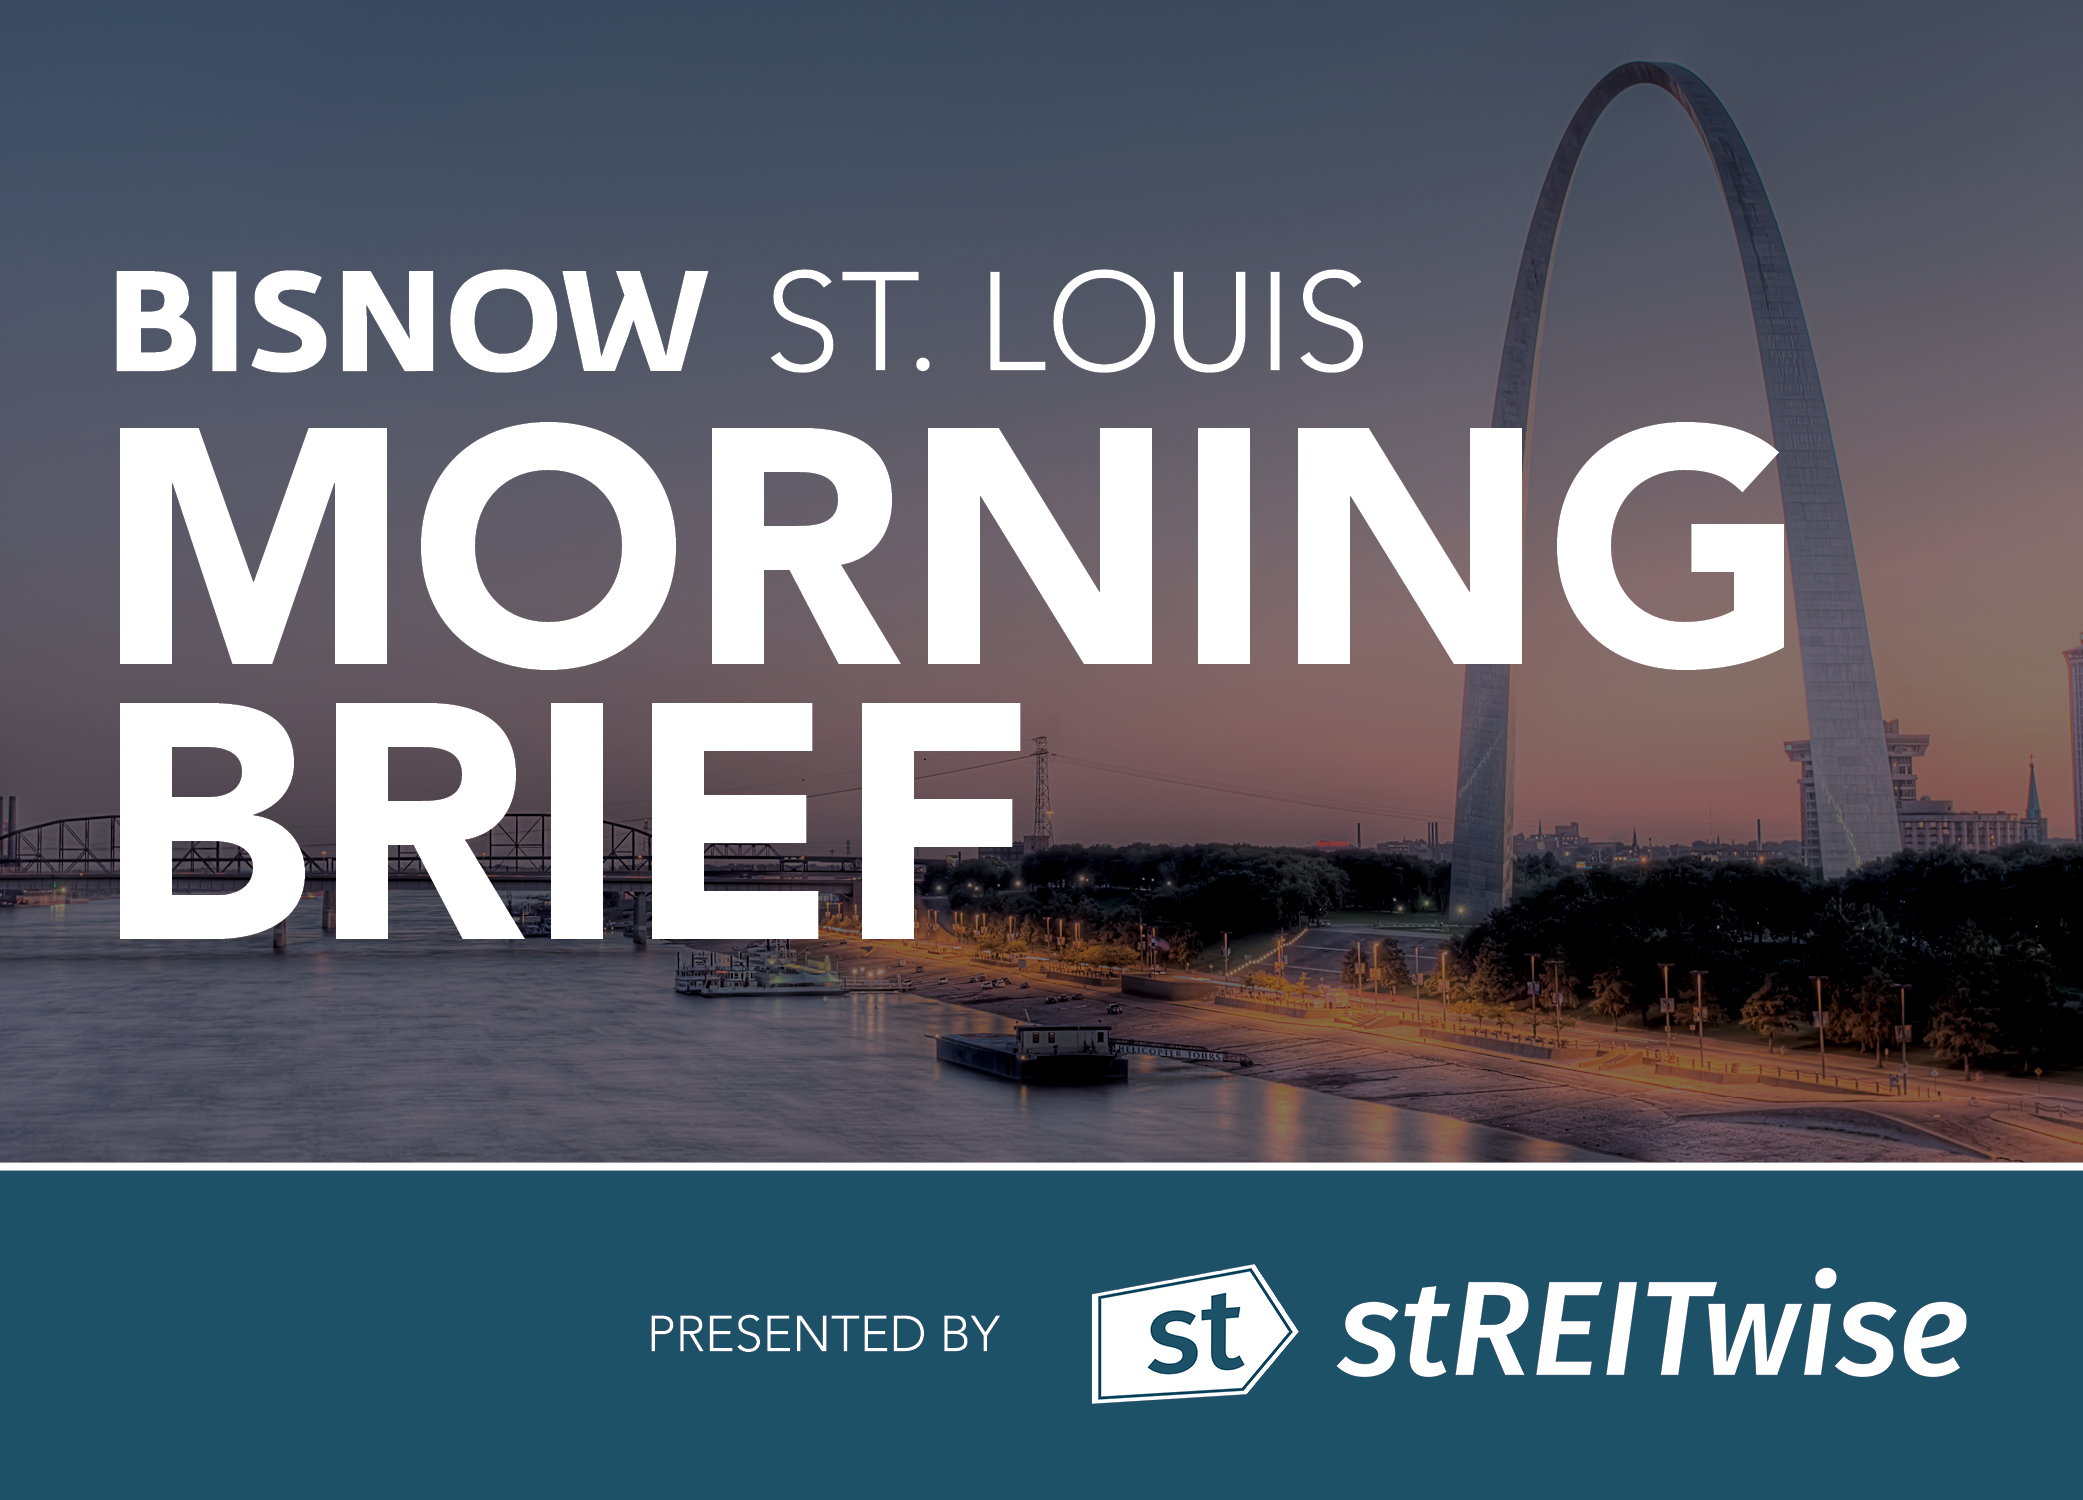 Bisnow Morning Brief St. Louis